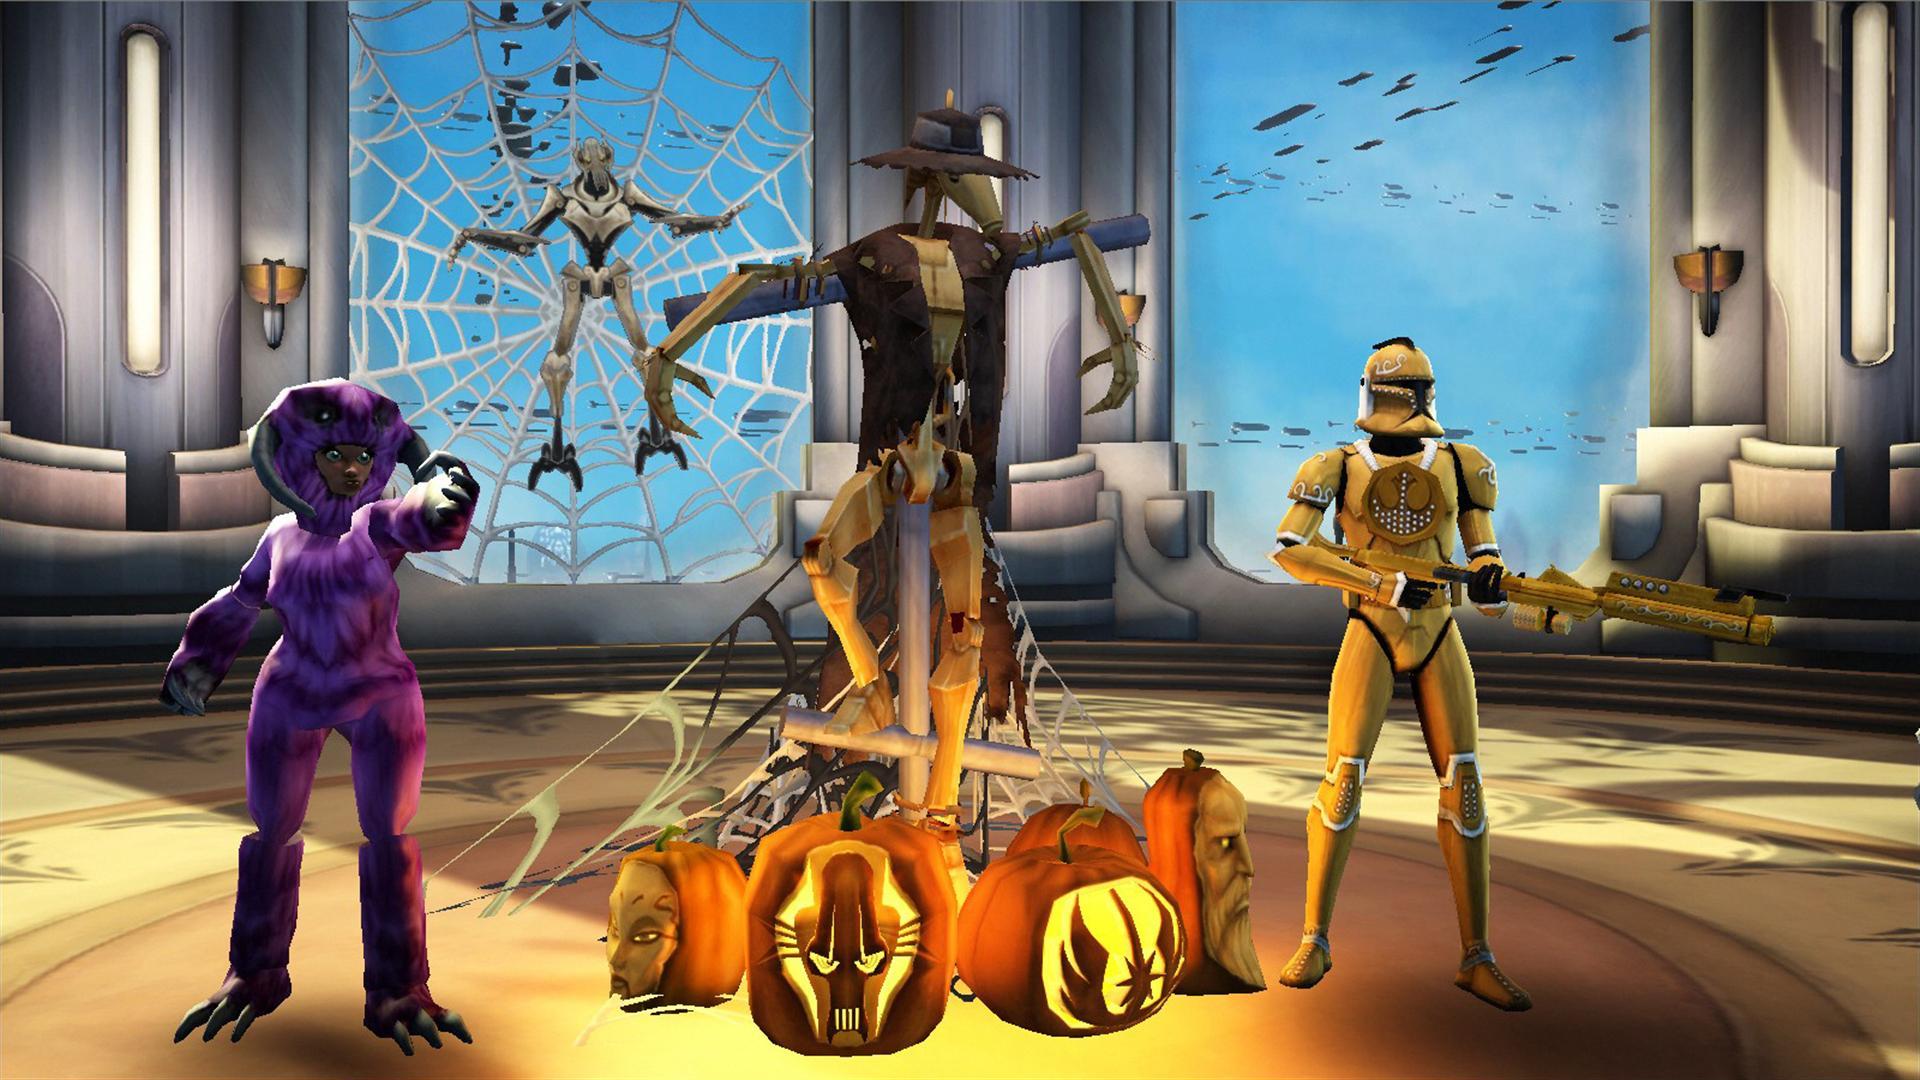 Top Wallpaper Halloween Star Wars - cwa_halloween_screenshot__11_-large  Graphic_19732.jpg